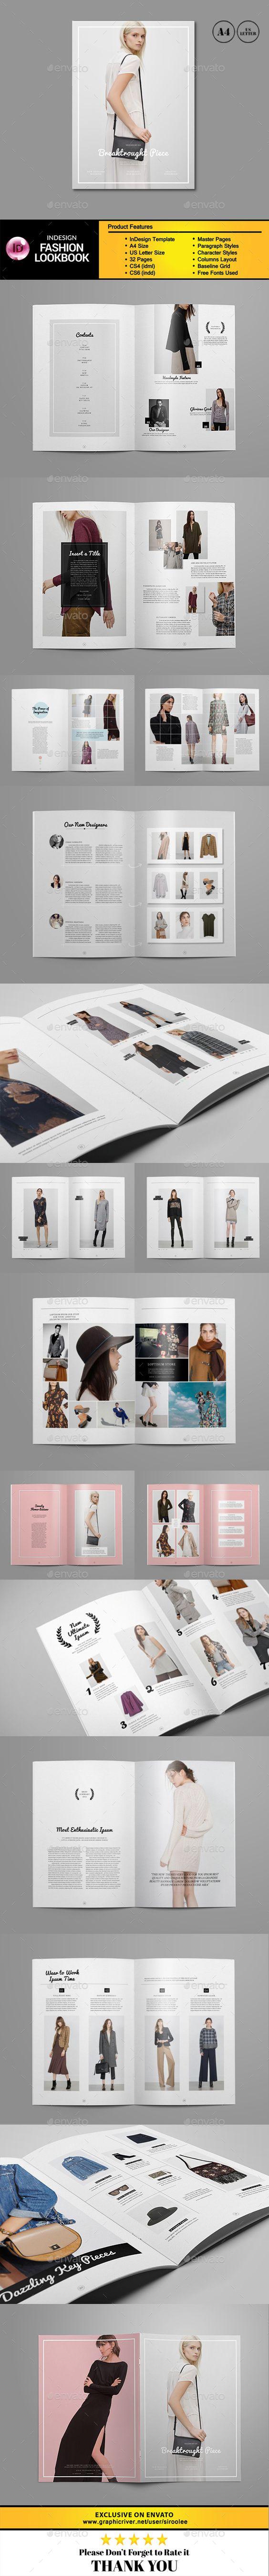 Fashion Lookbook Magazine